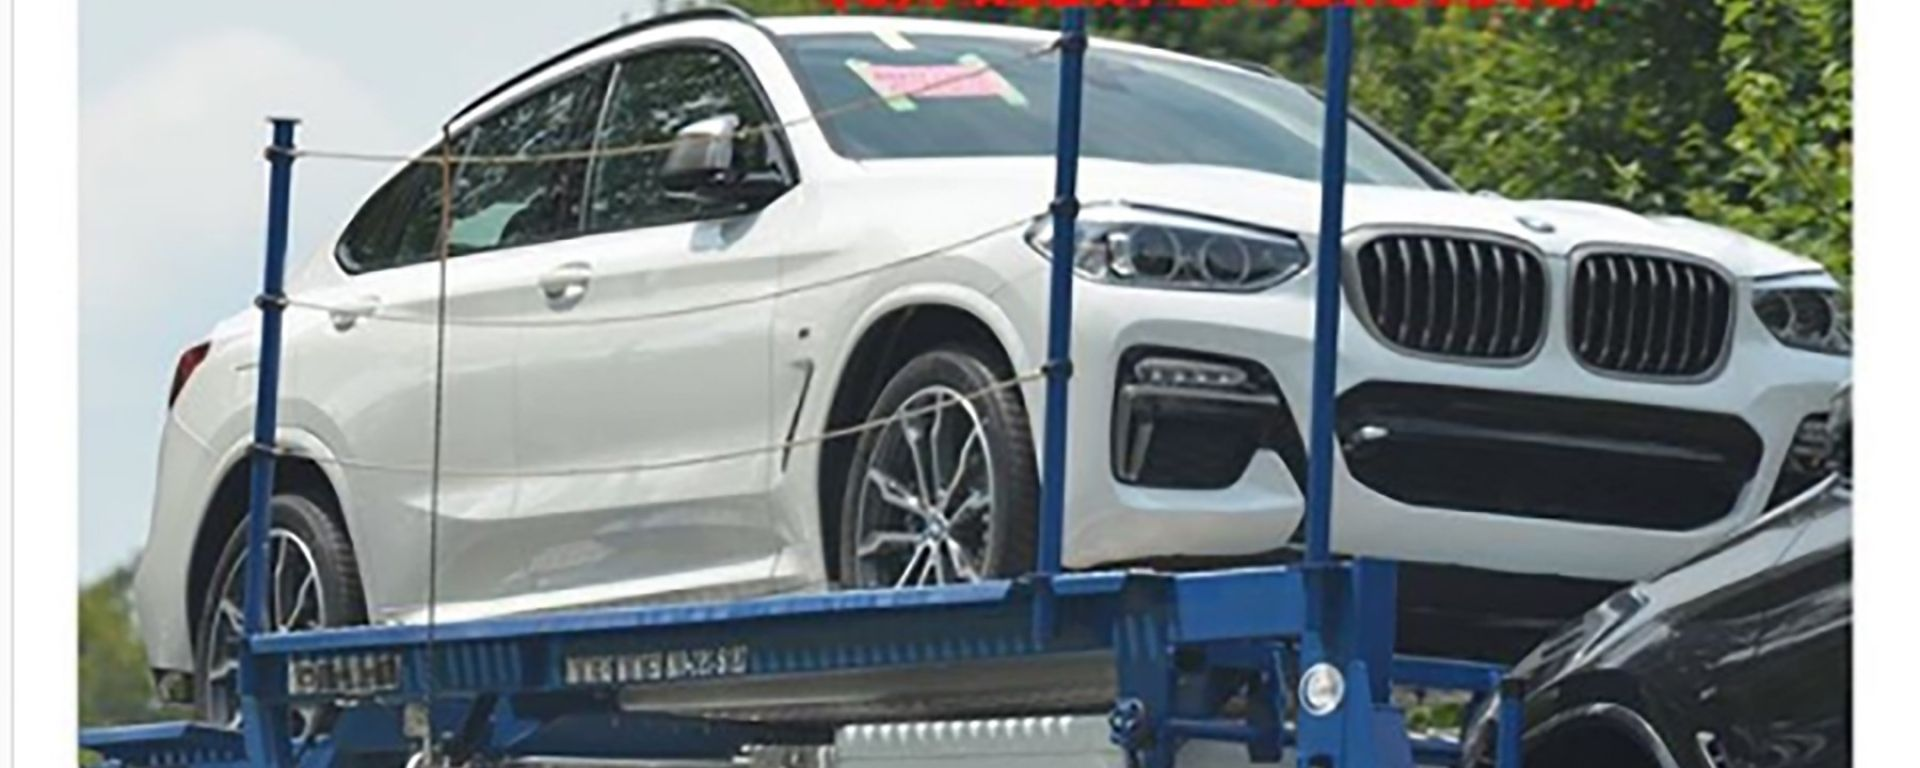 BMW X4: le foto spia